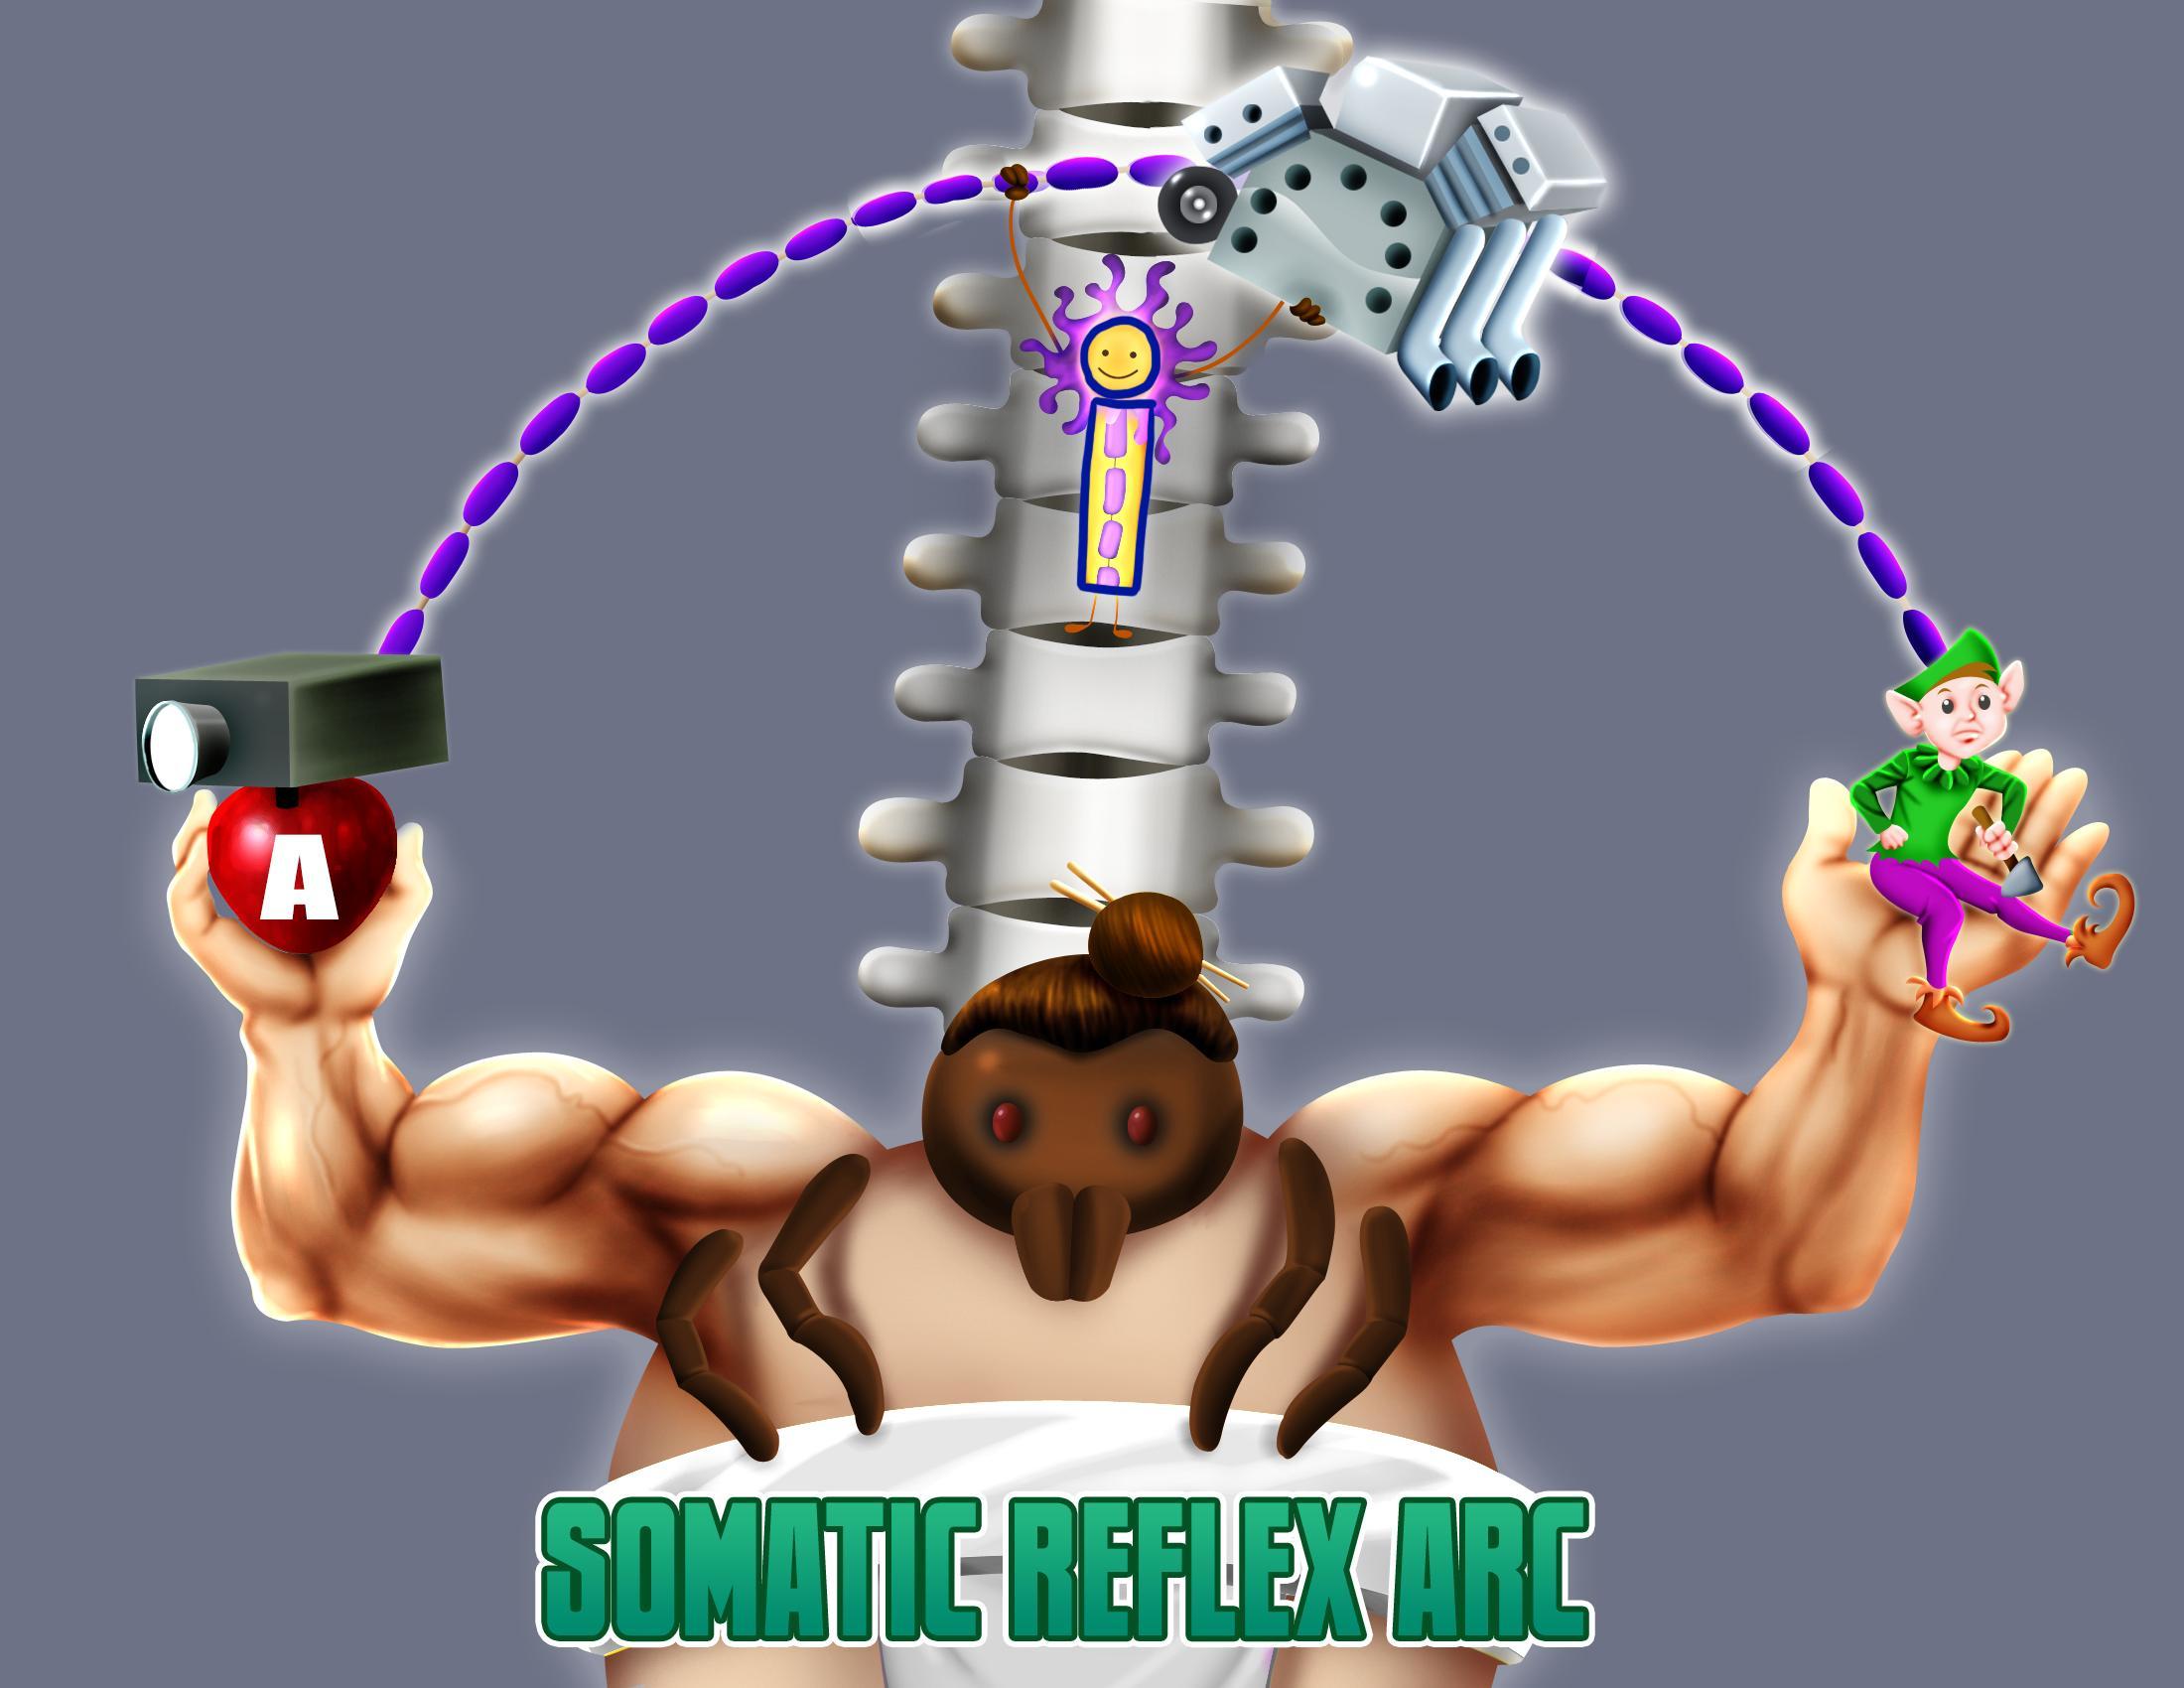 Somatic Reflex Arc